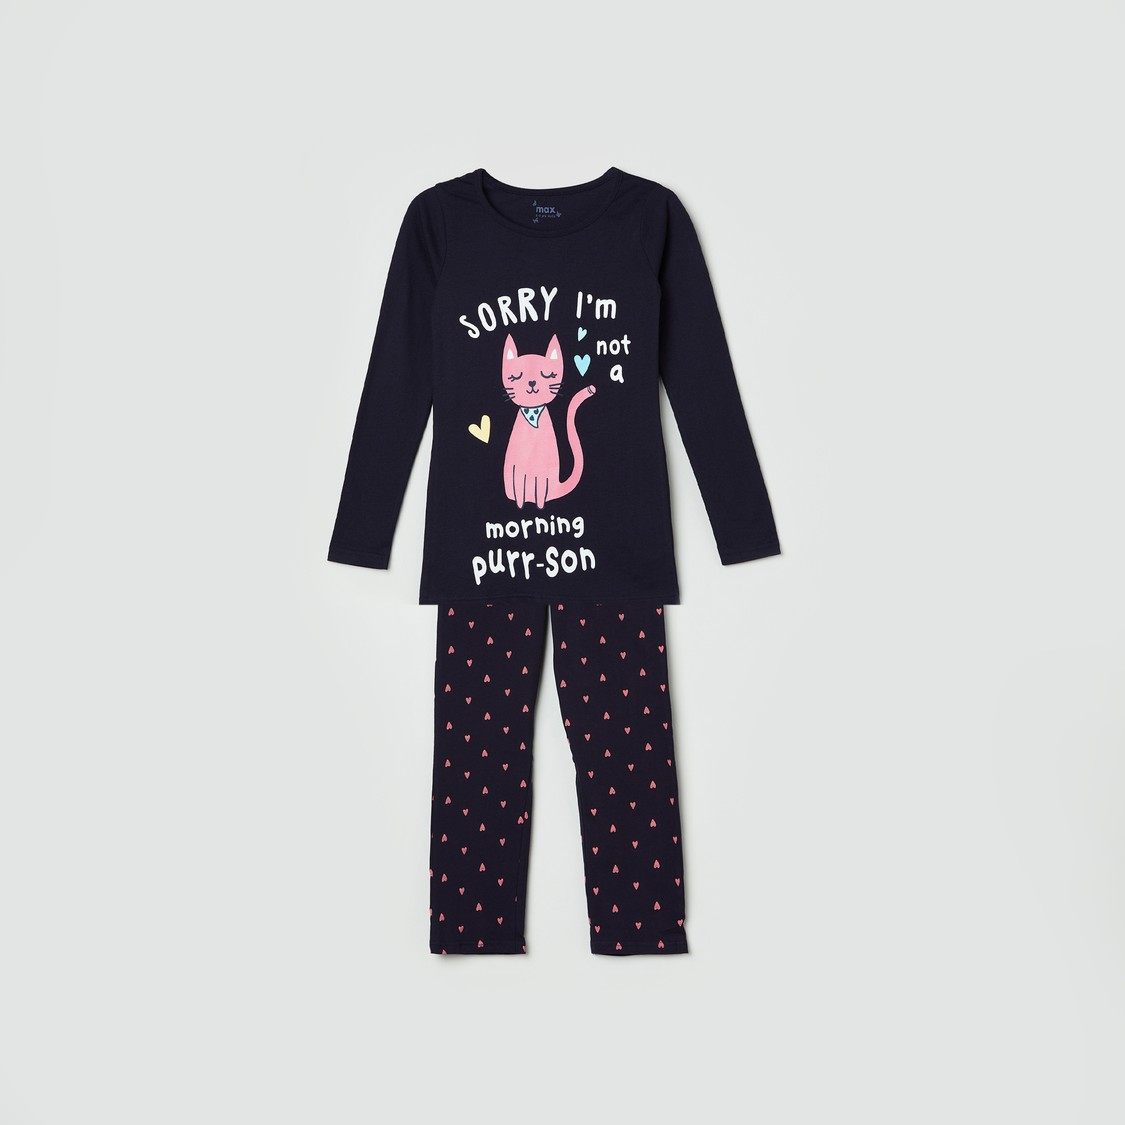 MAX Printed T-shirt with Elasticated Pants